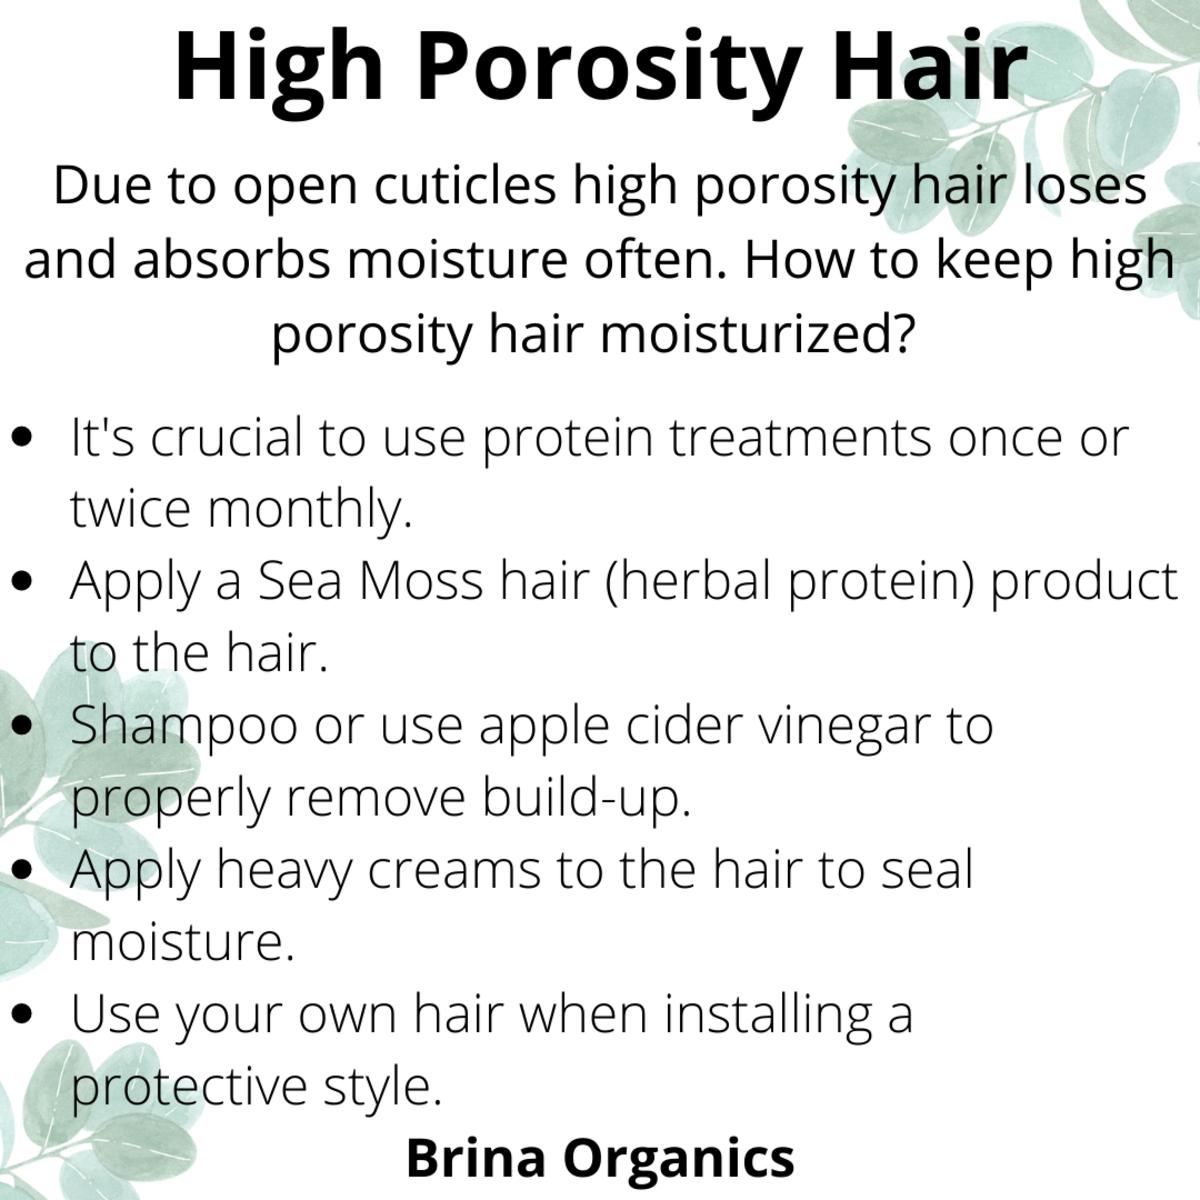 High Porosity Hair Tips